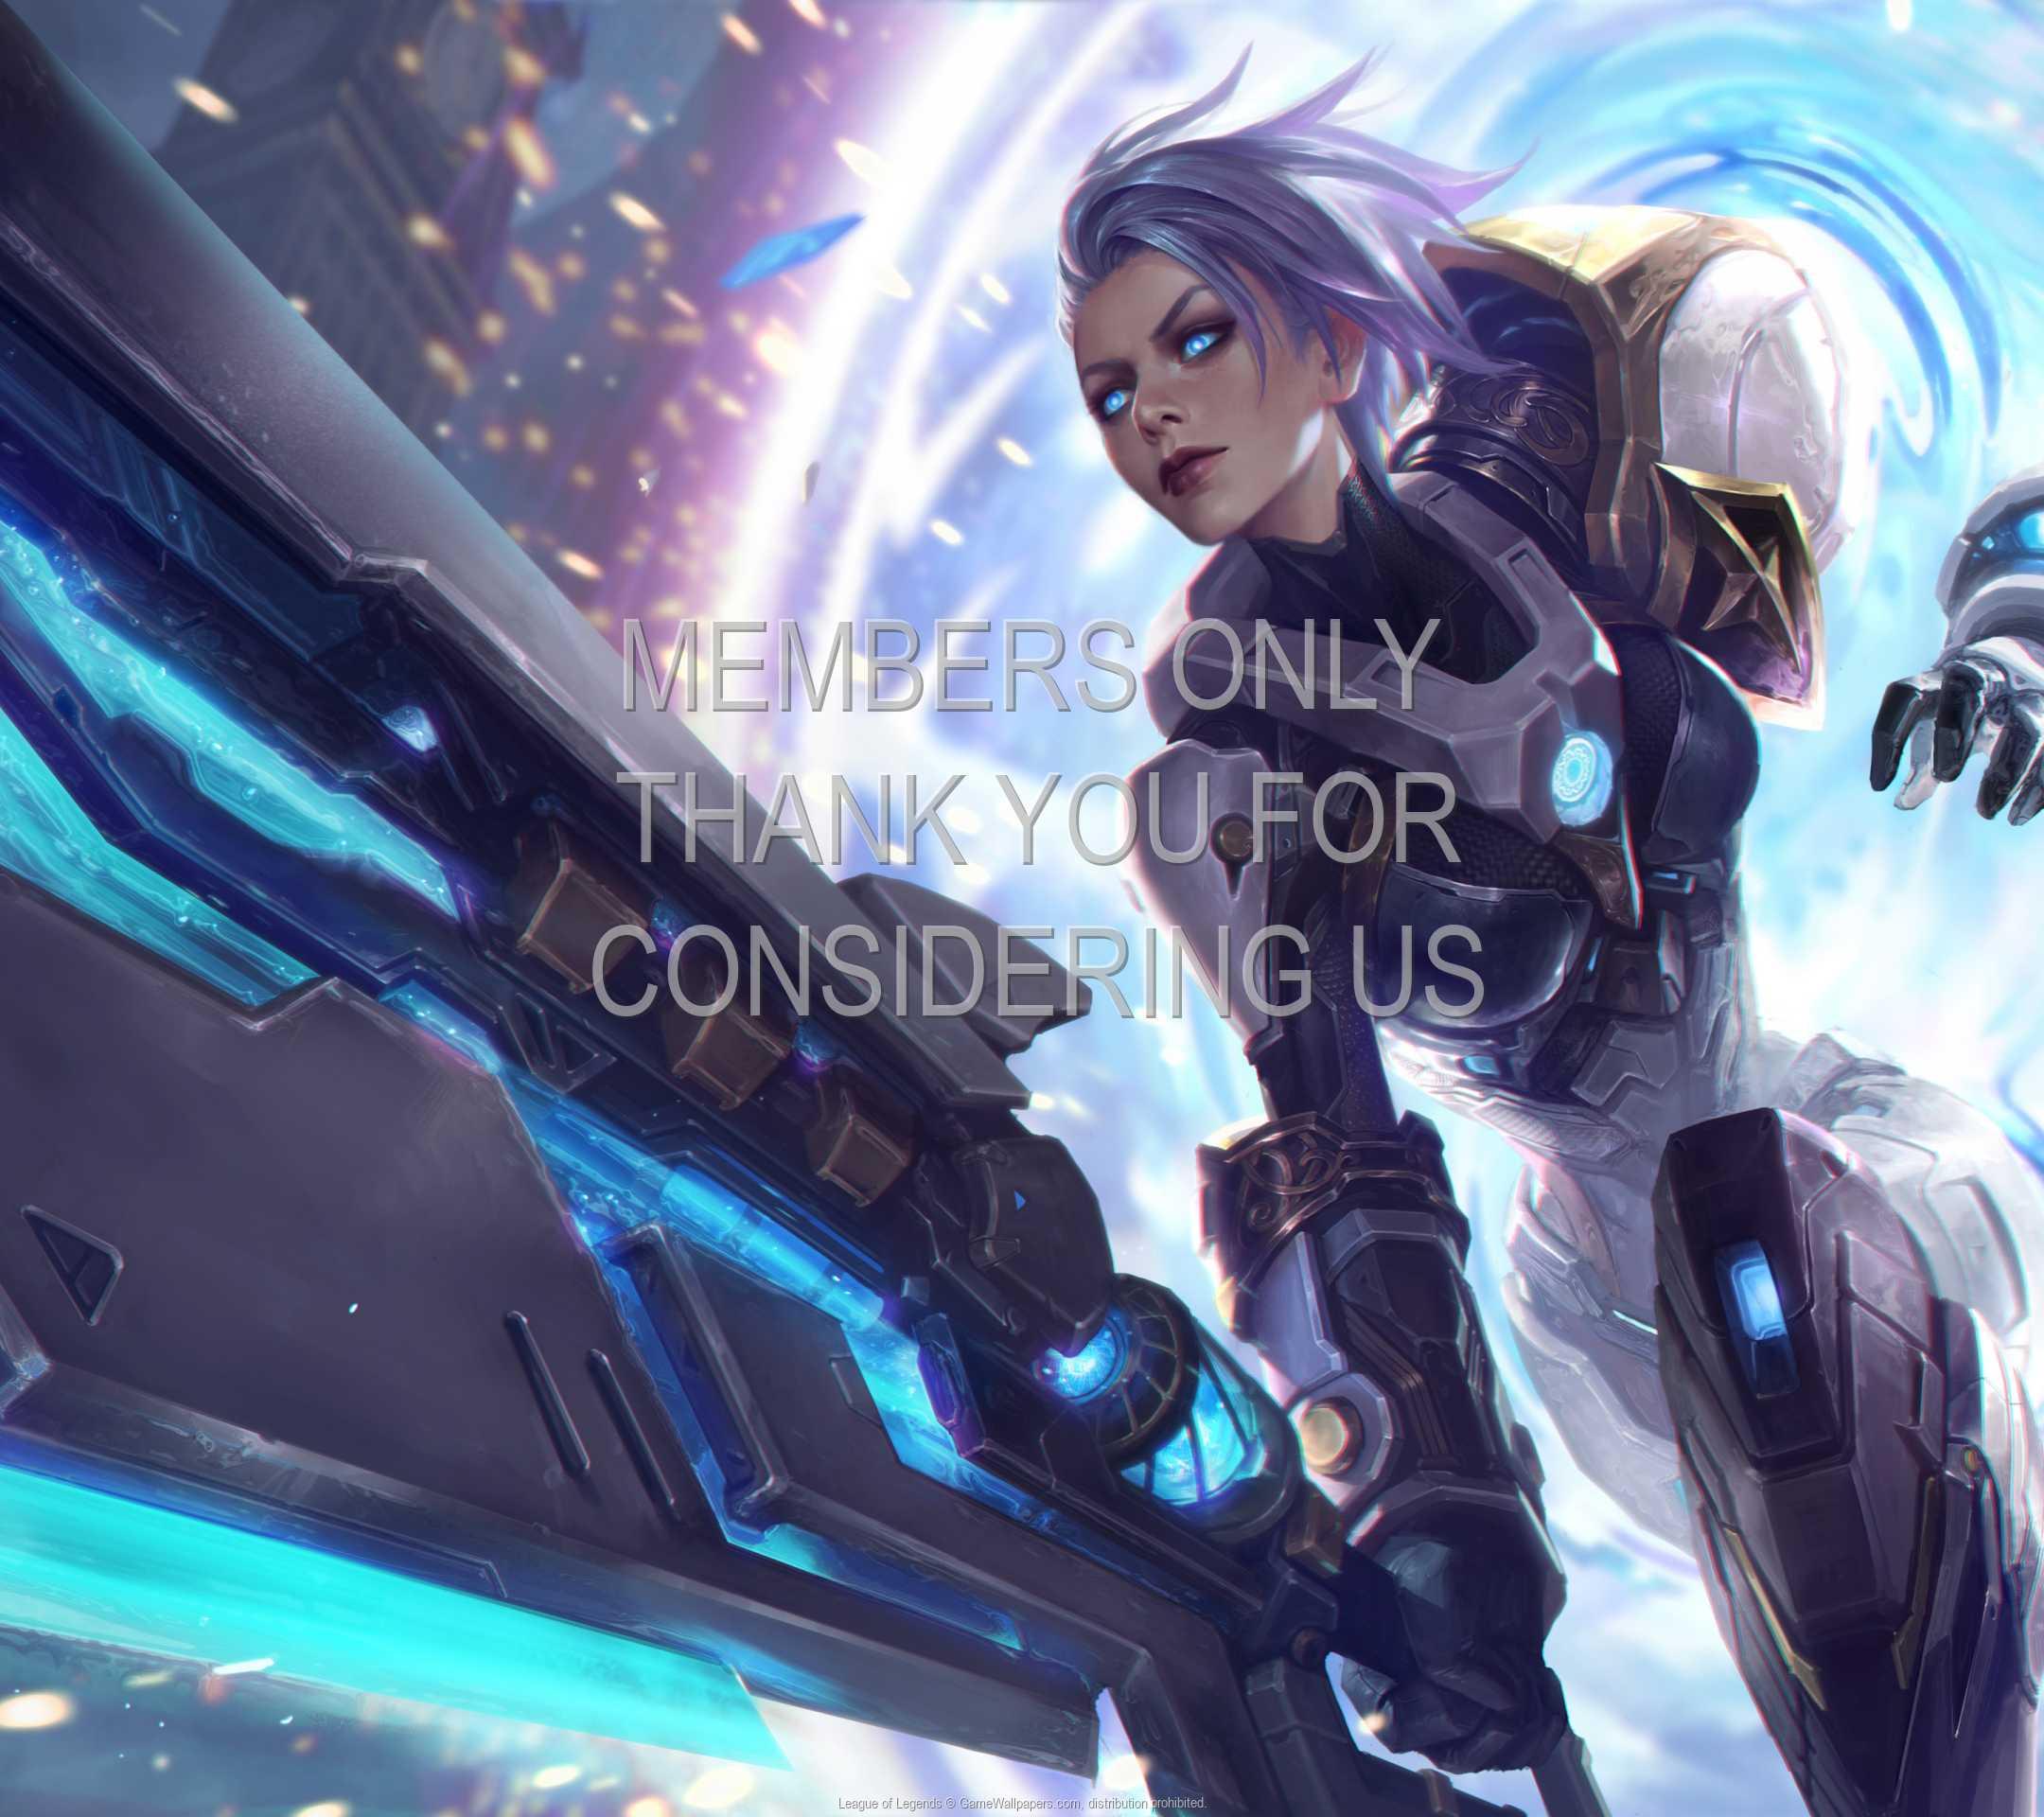 League of Legends 1080p Horizontal Handy Hintergrundbild 72